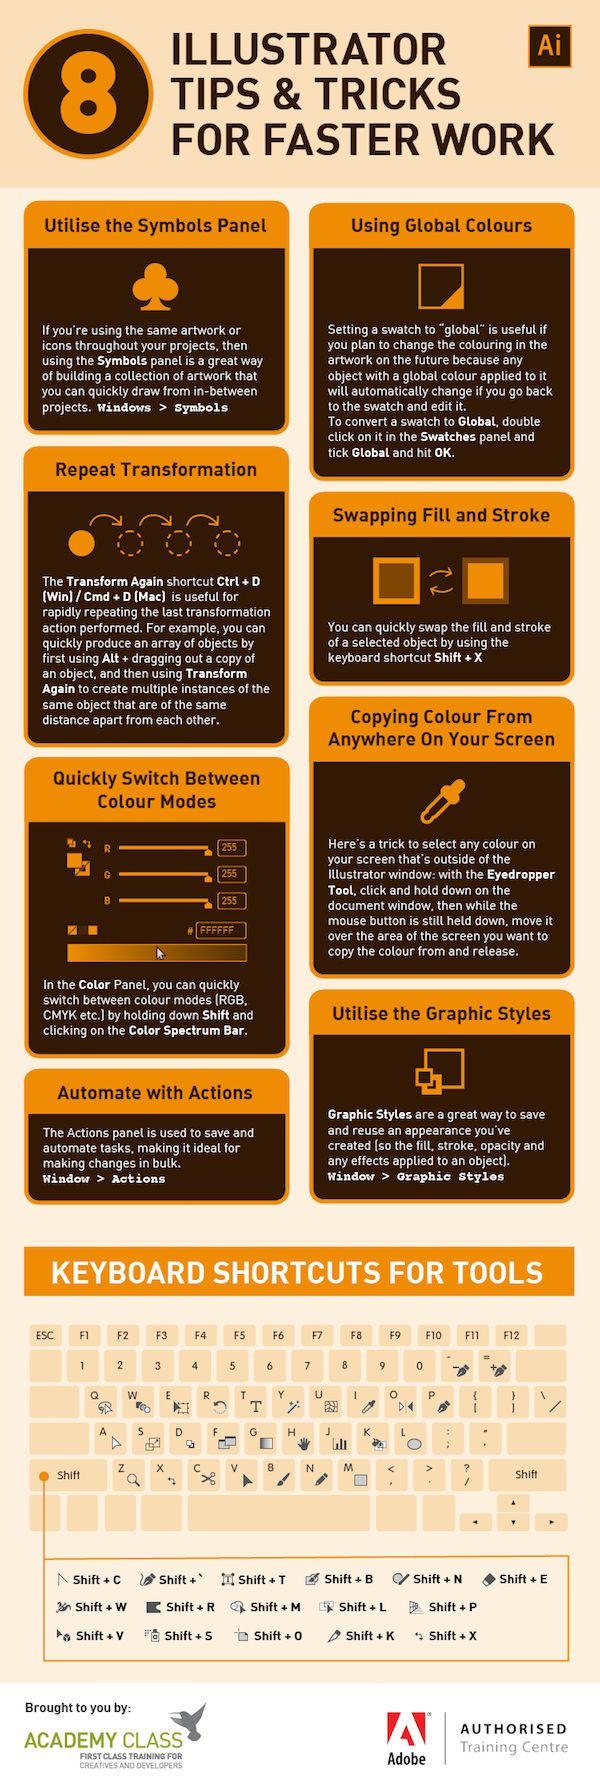 Illustrator Tips: 8 Adobe Illustrator Tips For Greater Efficiency   DesignTAXI.com   #illustrator #tips #trics